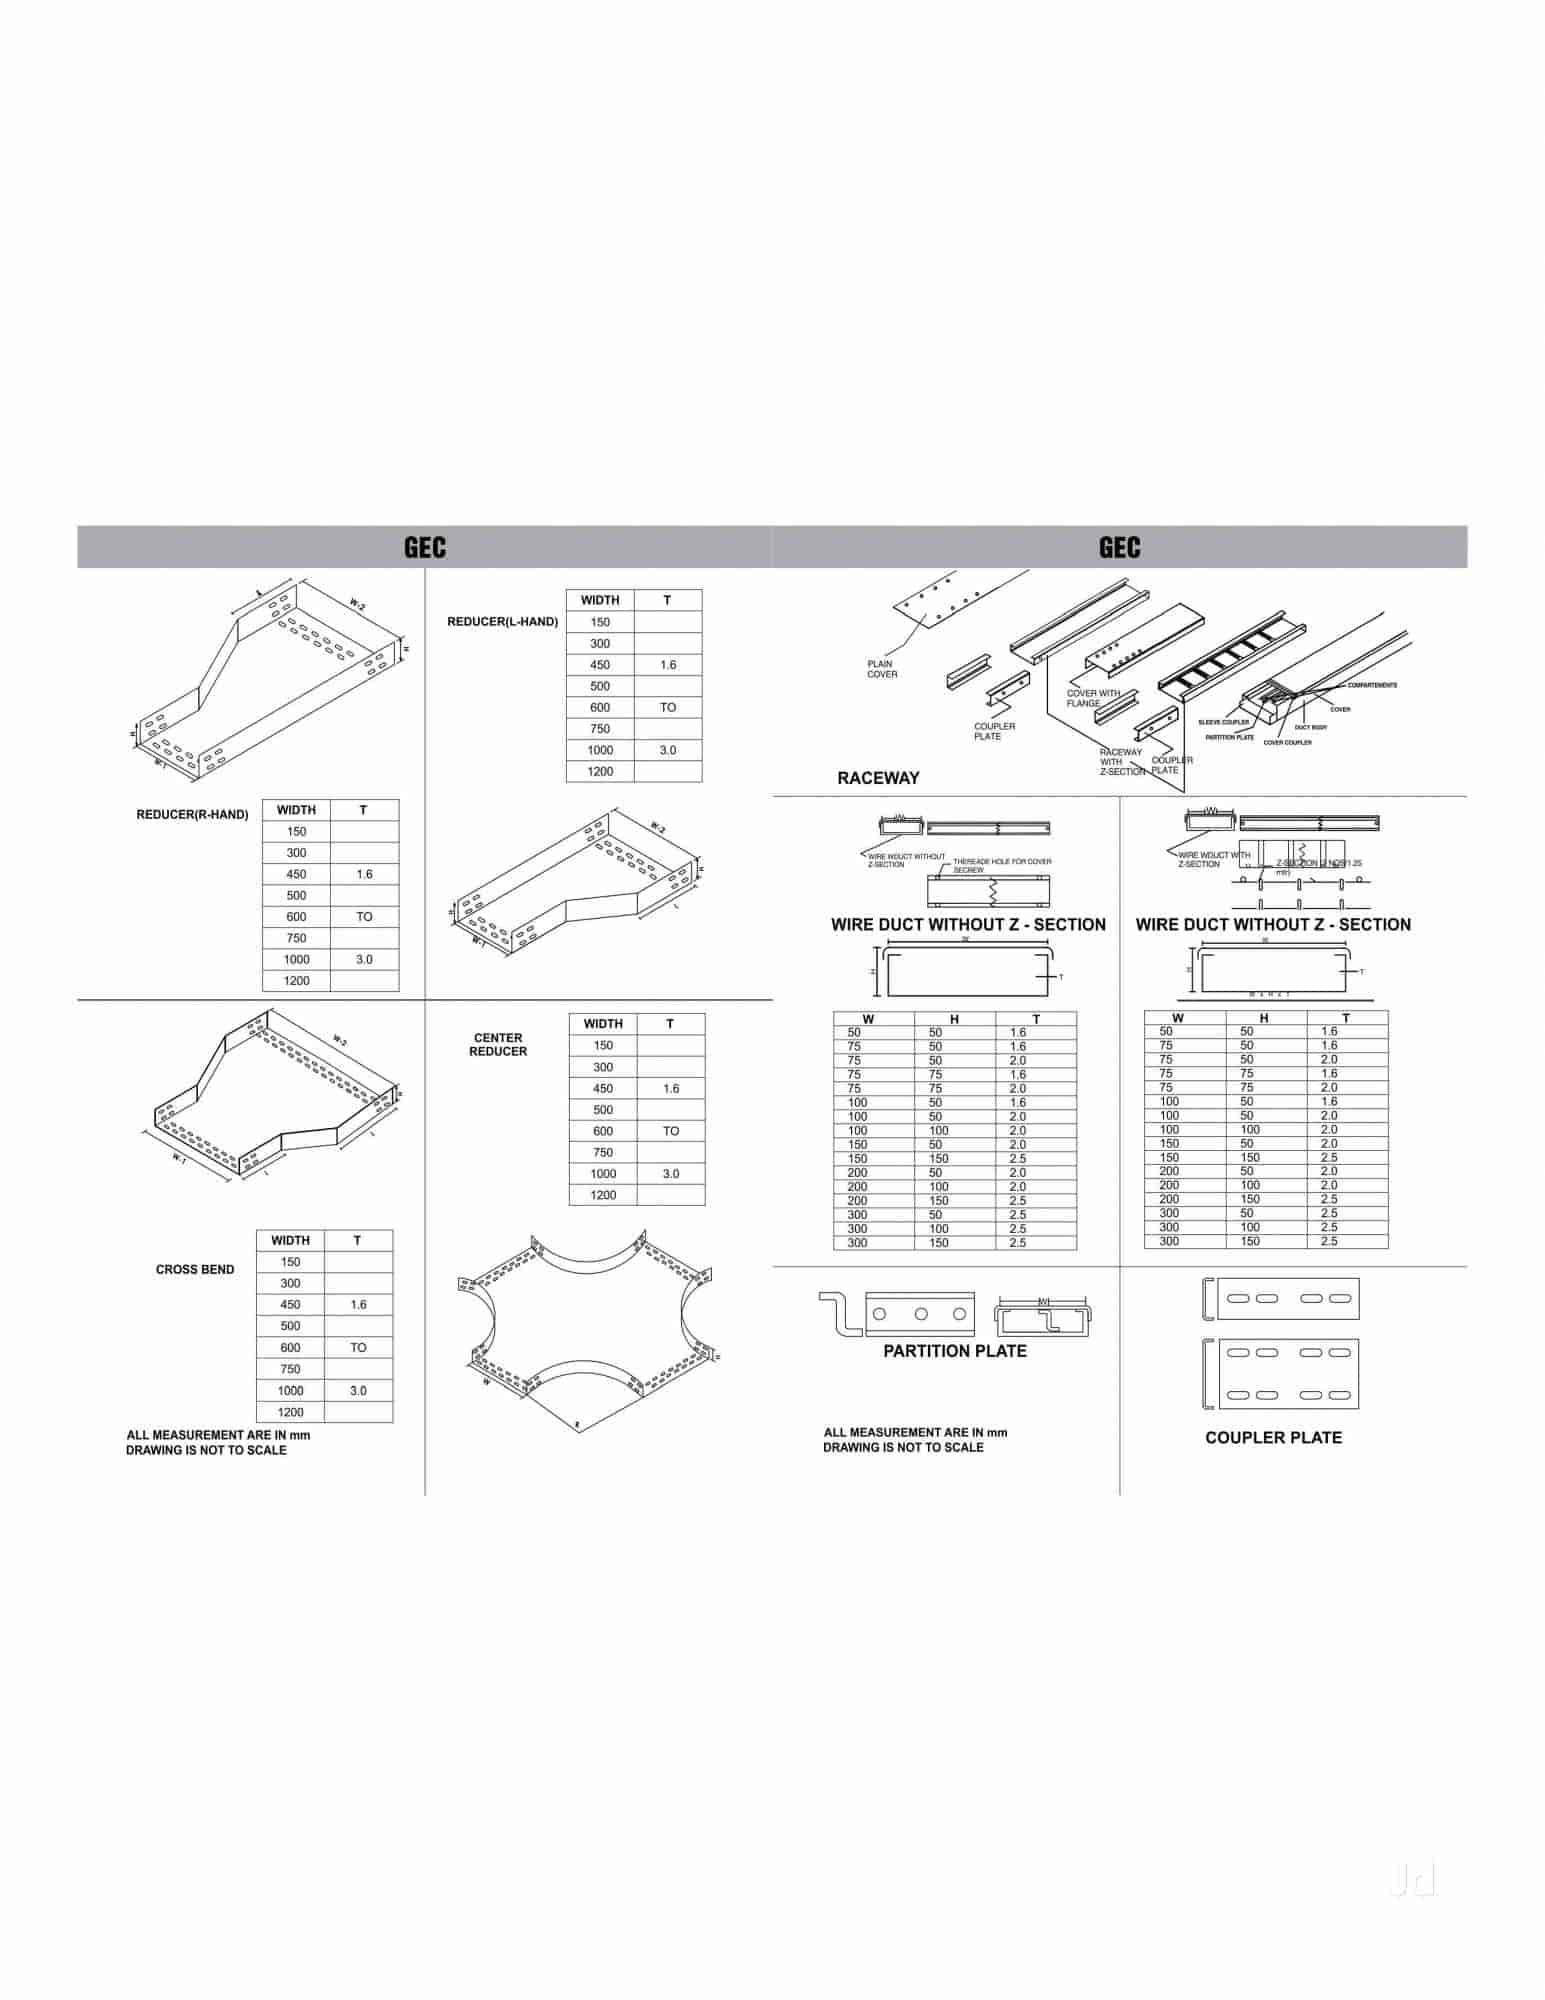 Global Electrical Controls Pvt Ltd Greater Noida 150a Main Breaker Box Wiring Diagram Contractors In Delhi Justdial